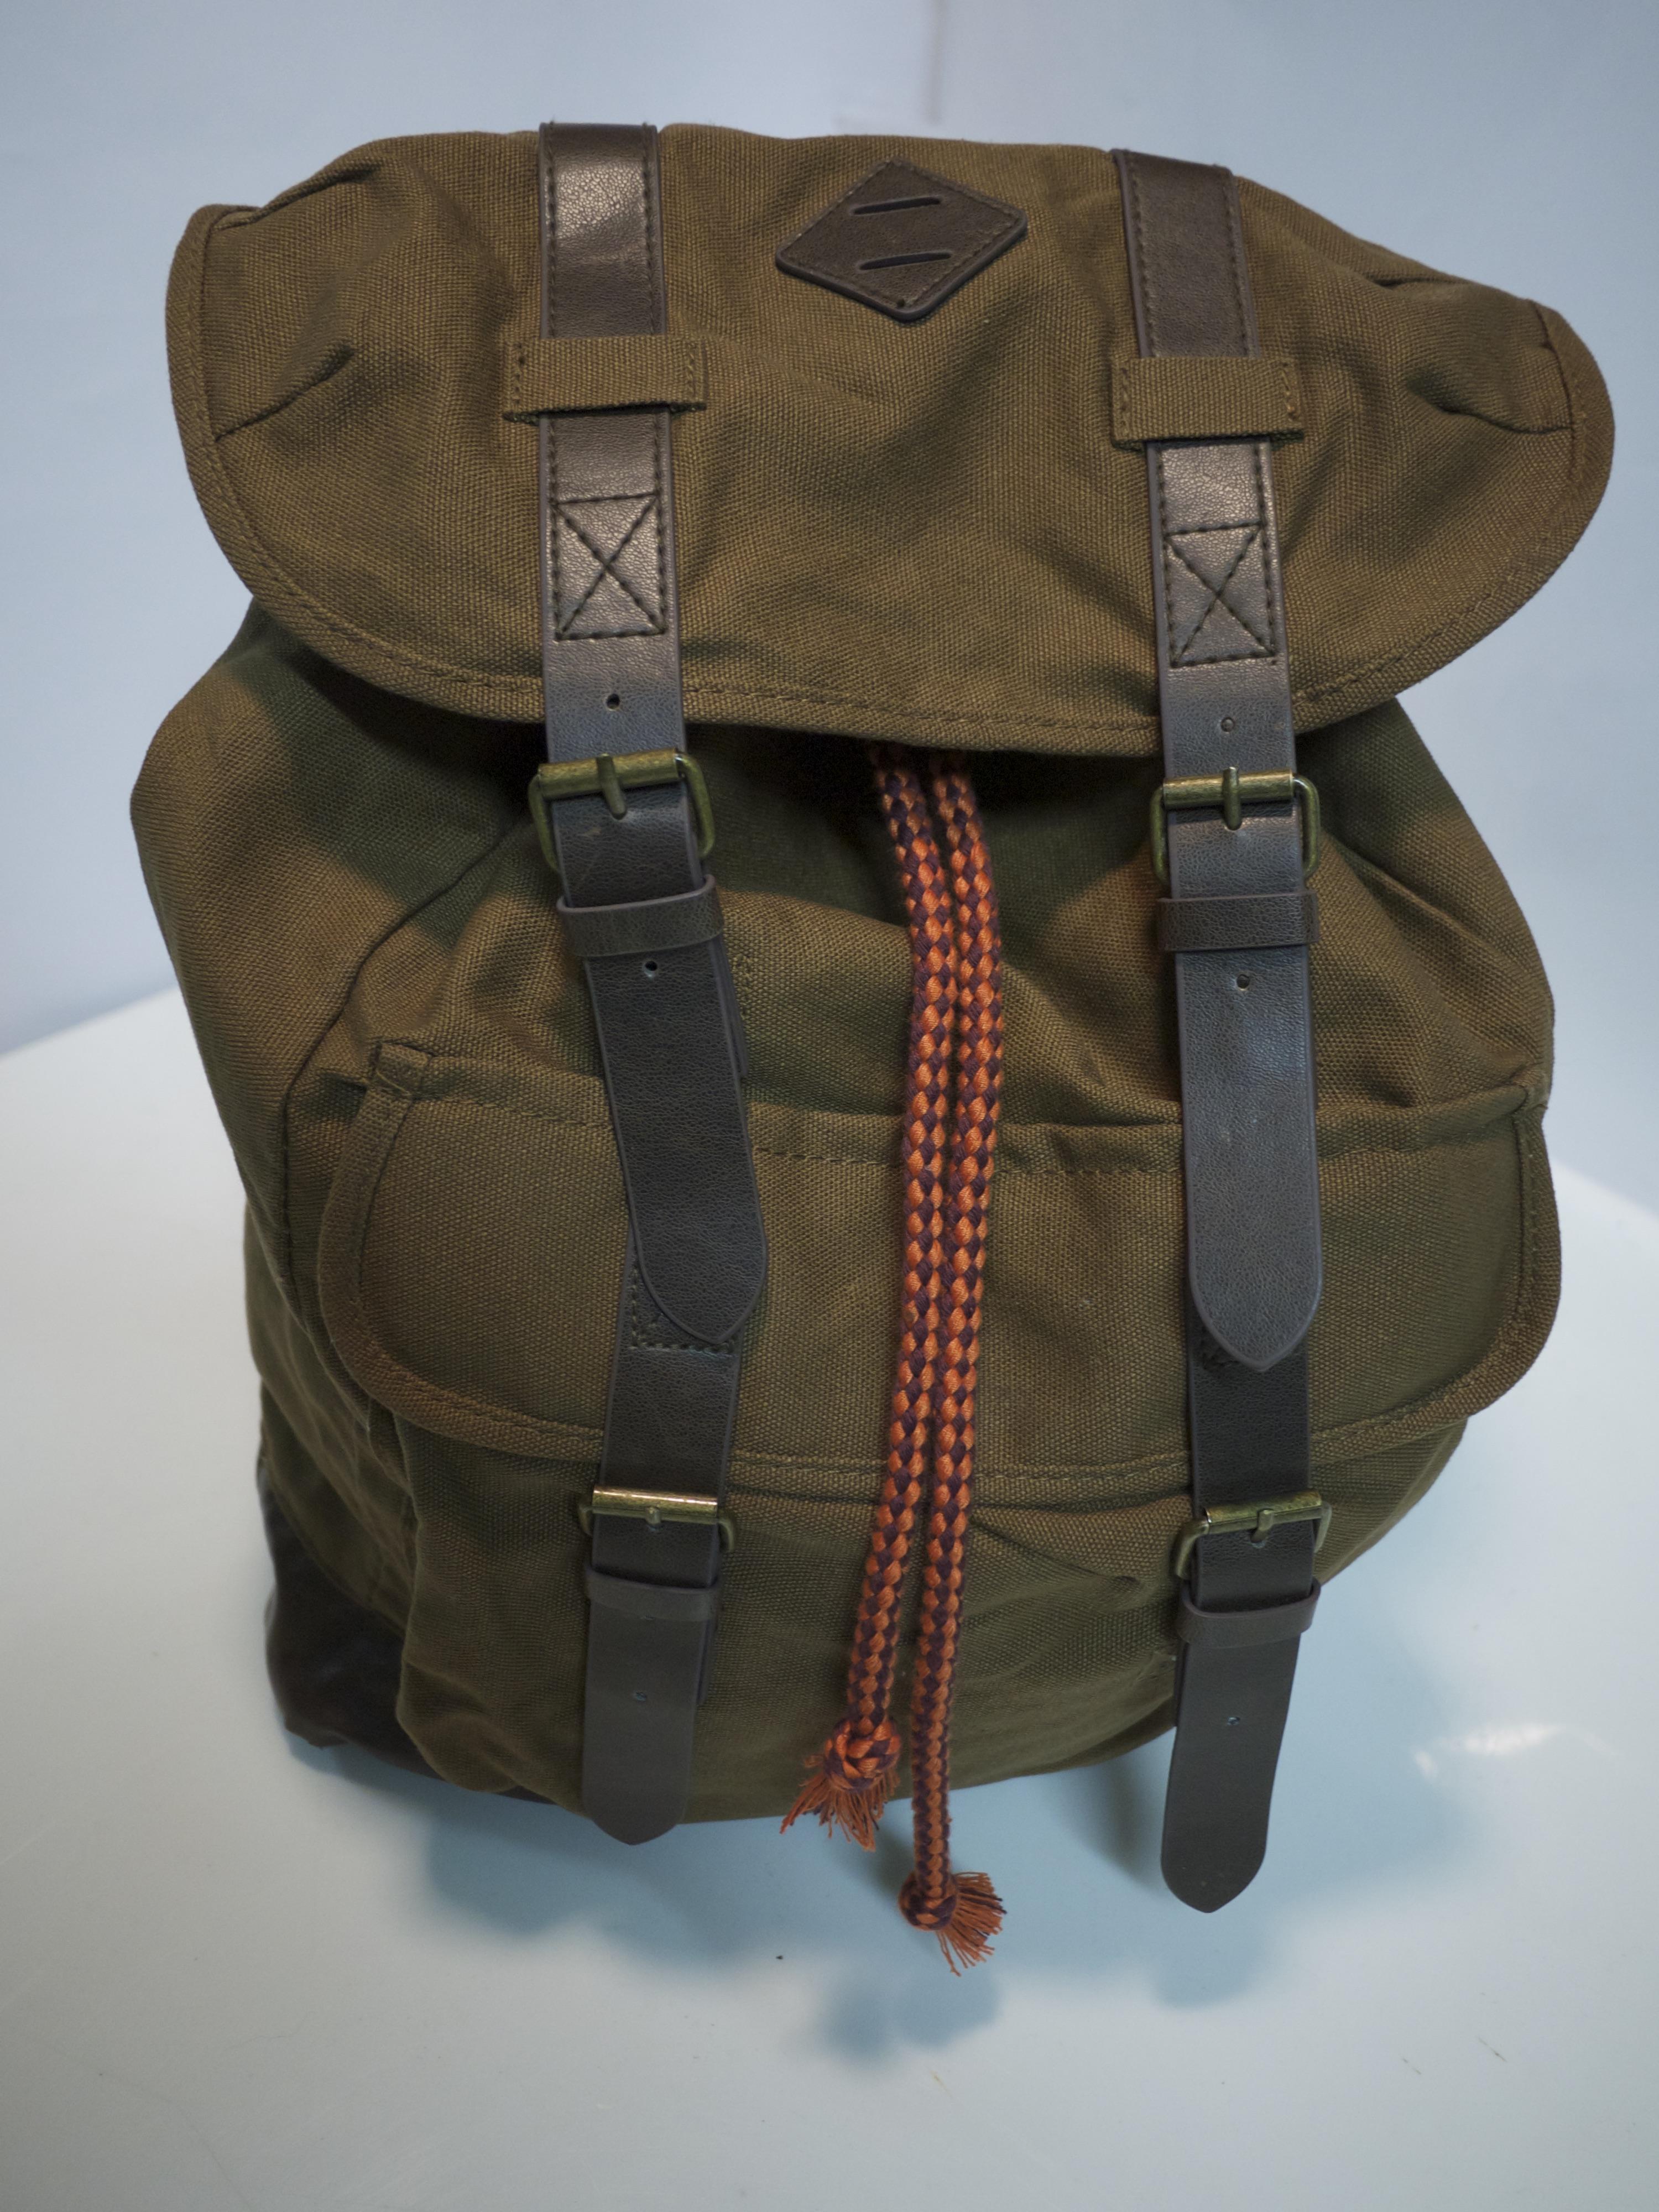 Knapsack backpack